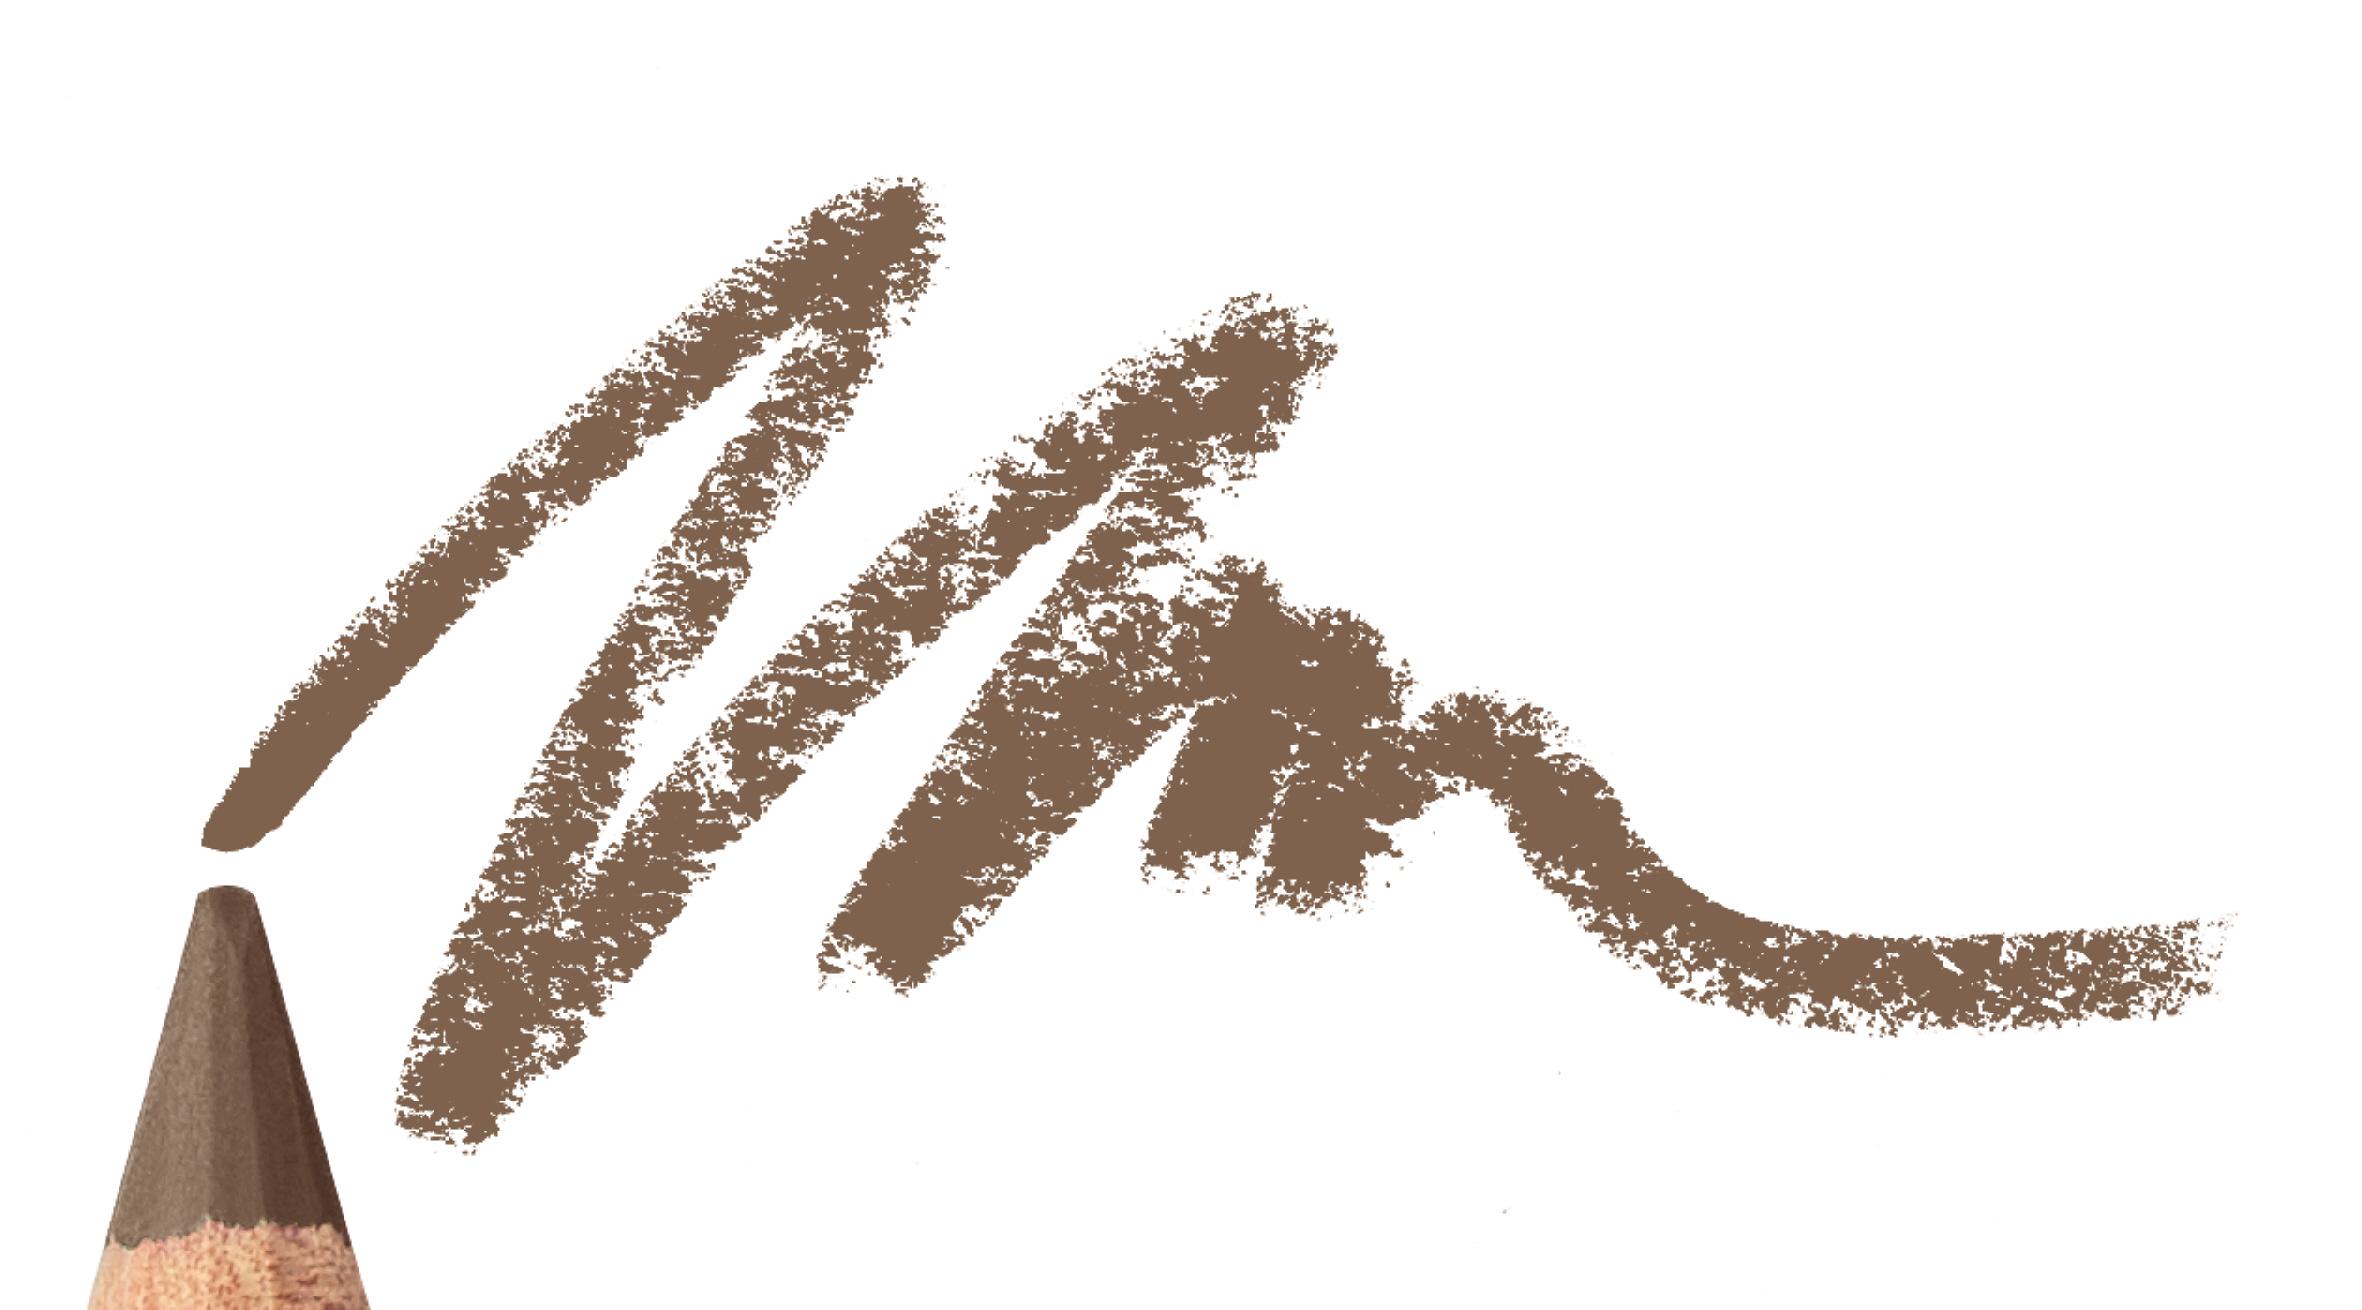 Карандаш для глаз, губ и бровей Artist Color Pencil eye, lip and brow matte pencil 1,41 г (506 Бесконечное какао) Make Up For Ever